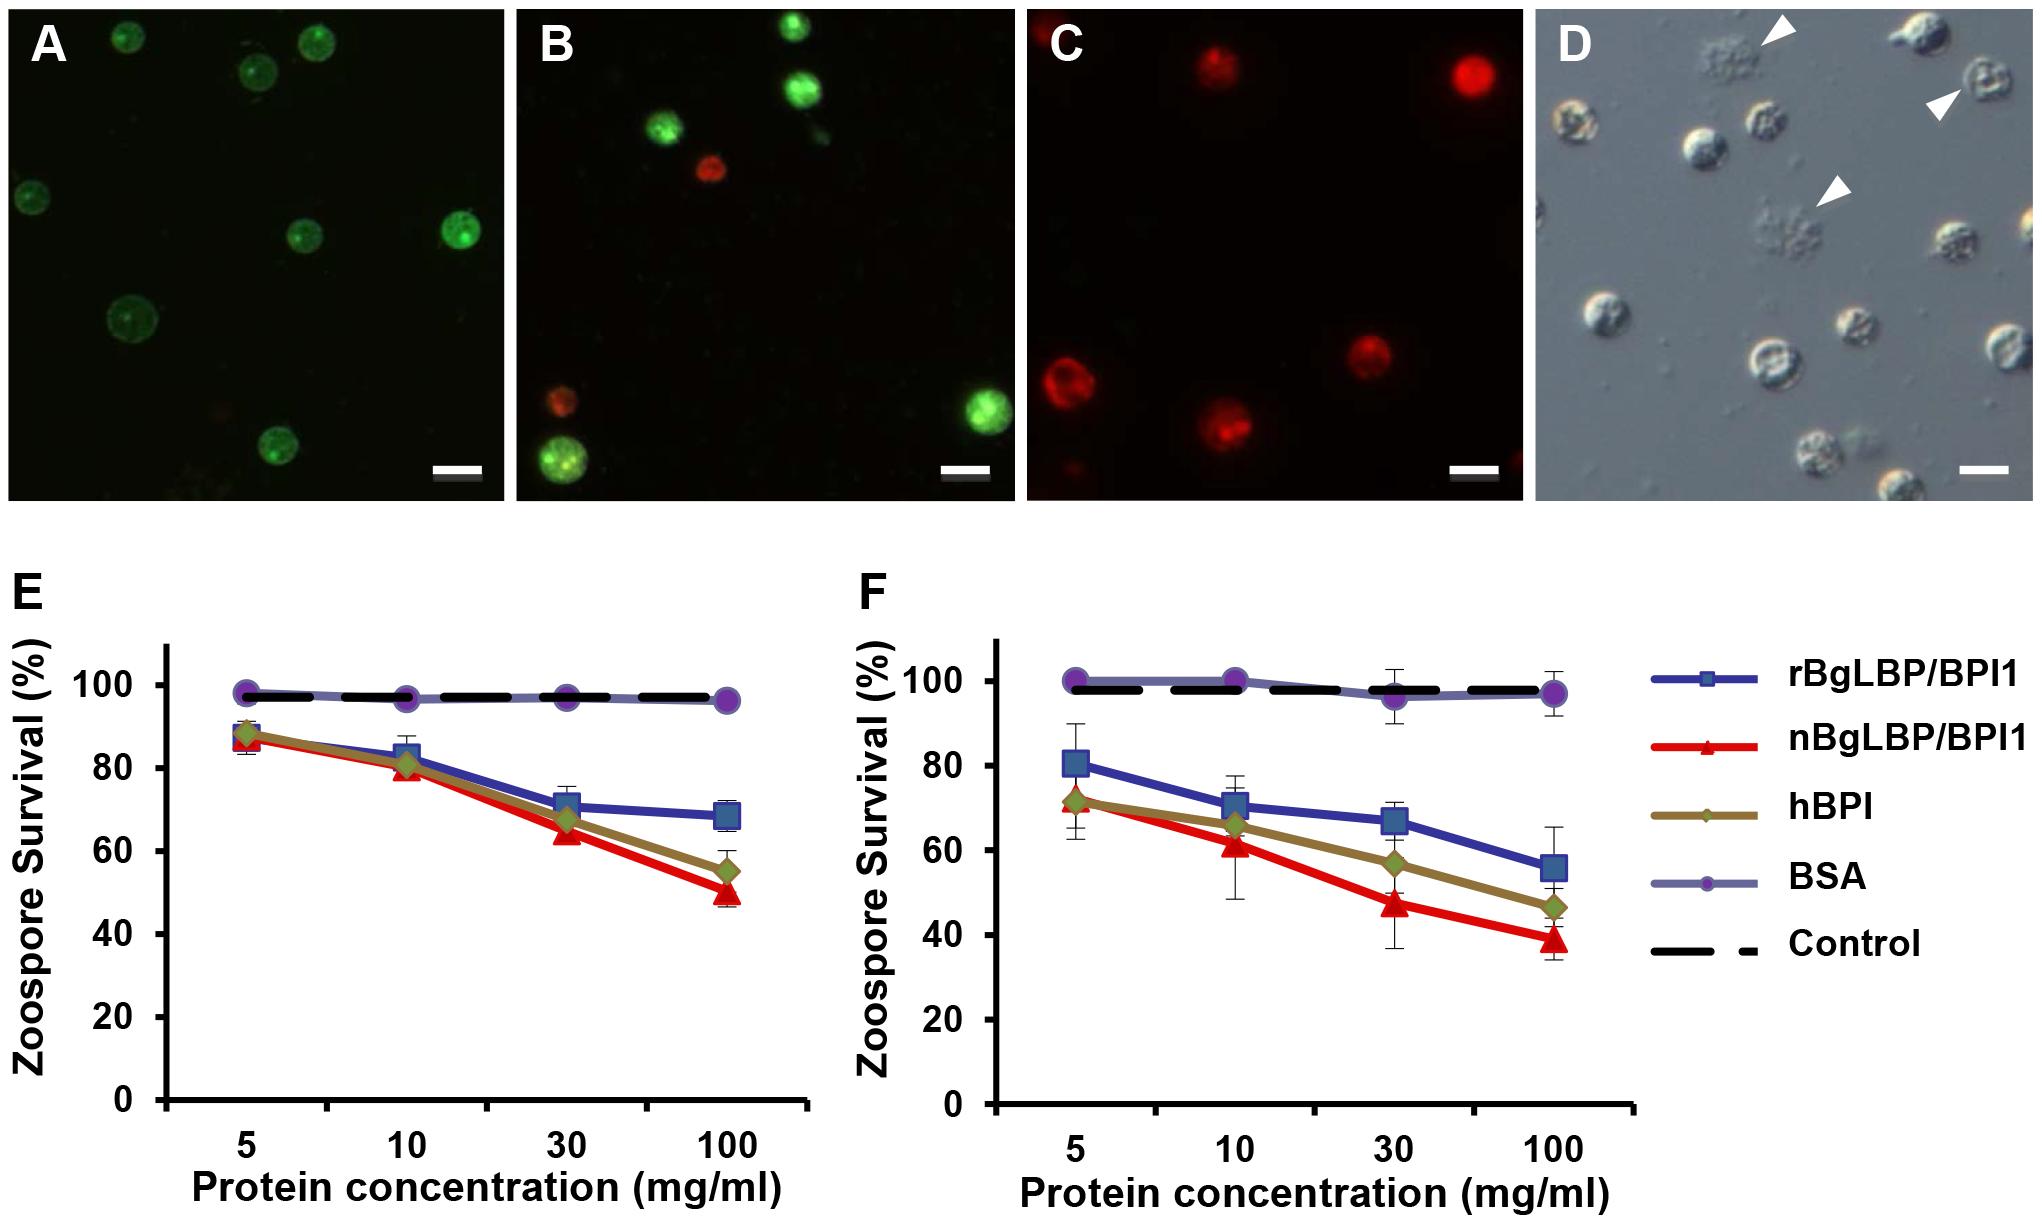 BgLBP/BPI1 and hBPI display anti-oomycete activity against <i>Saprolegnia parasitica</i> and <i>S. diclina</i>.